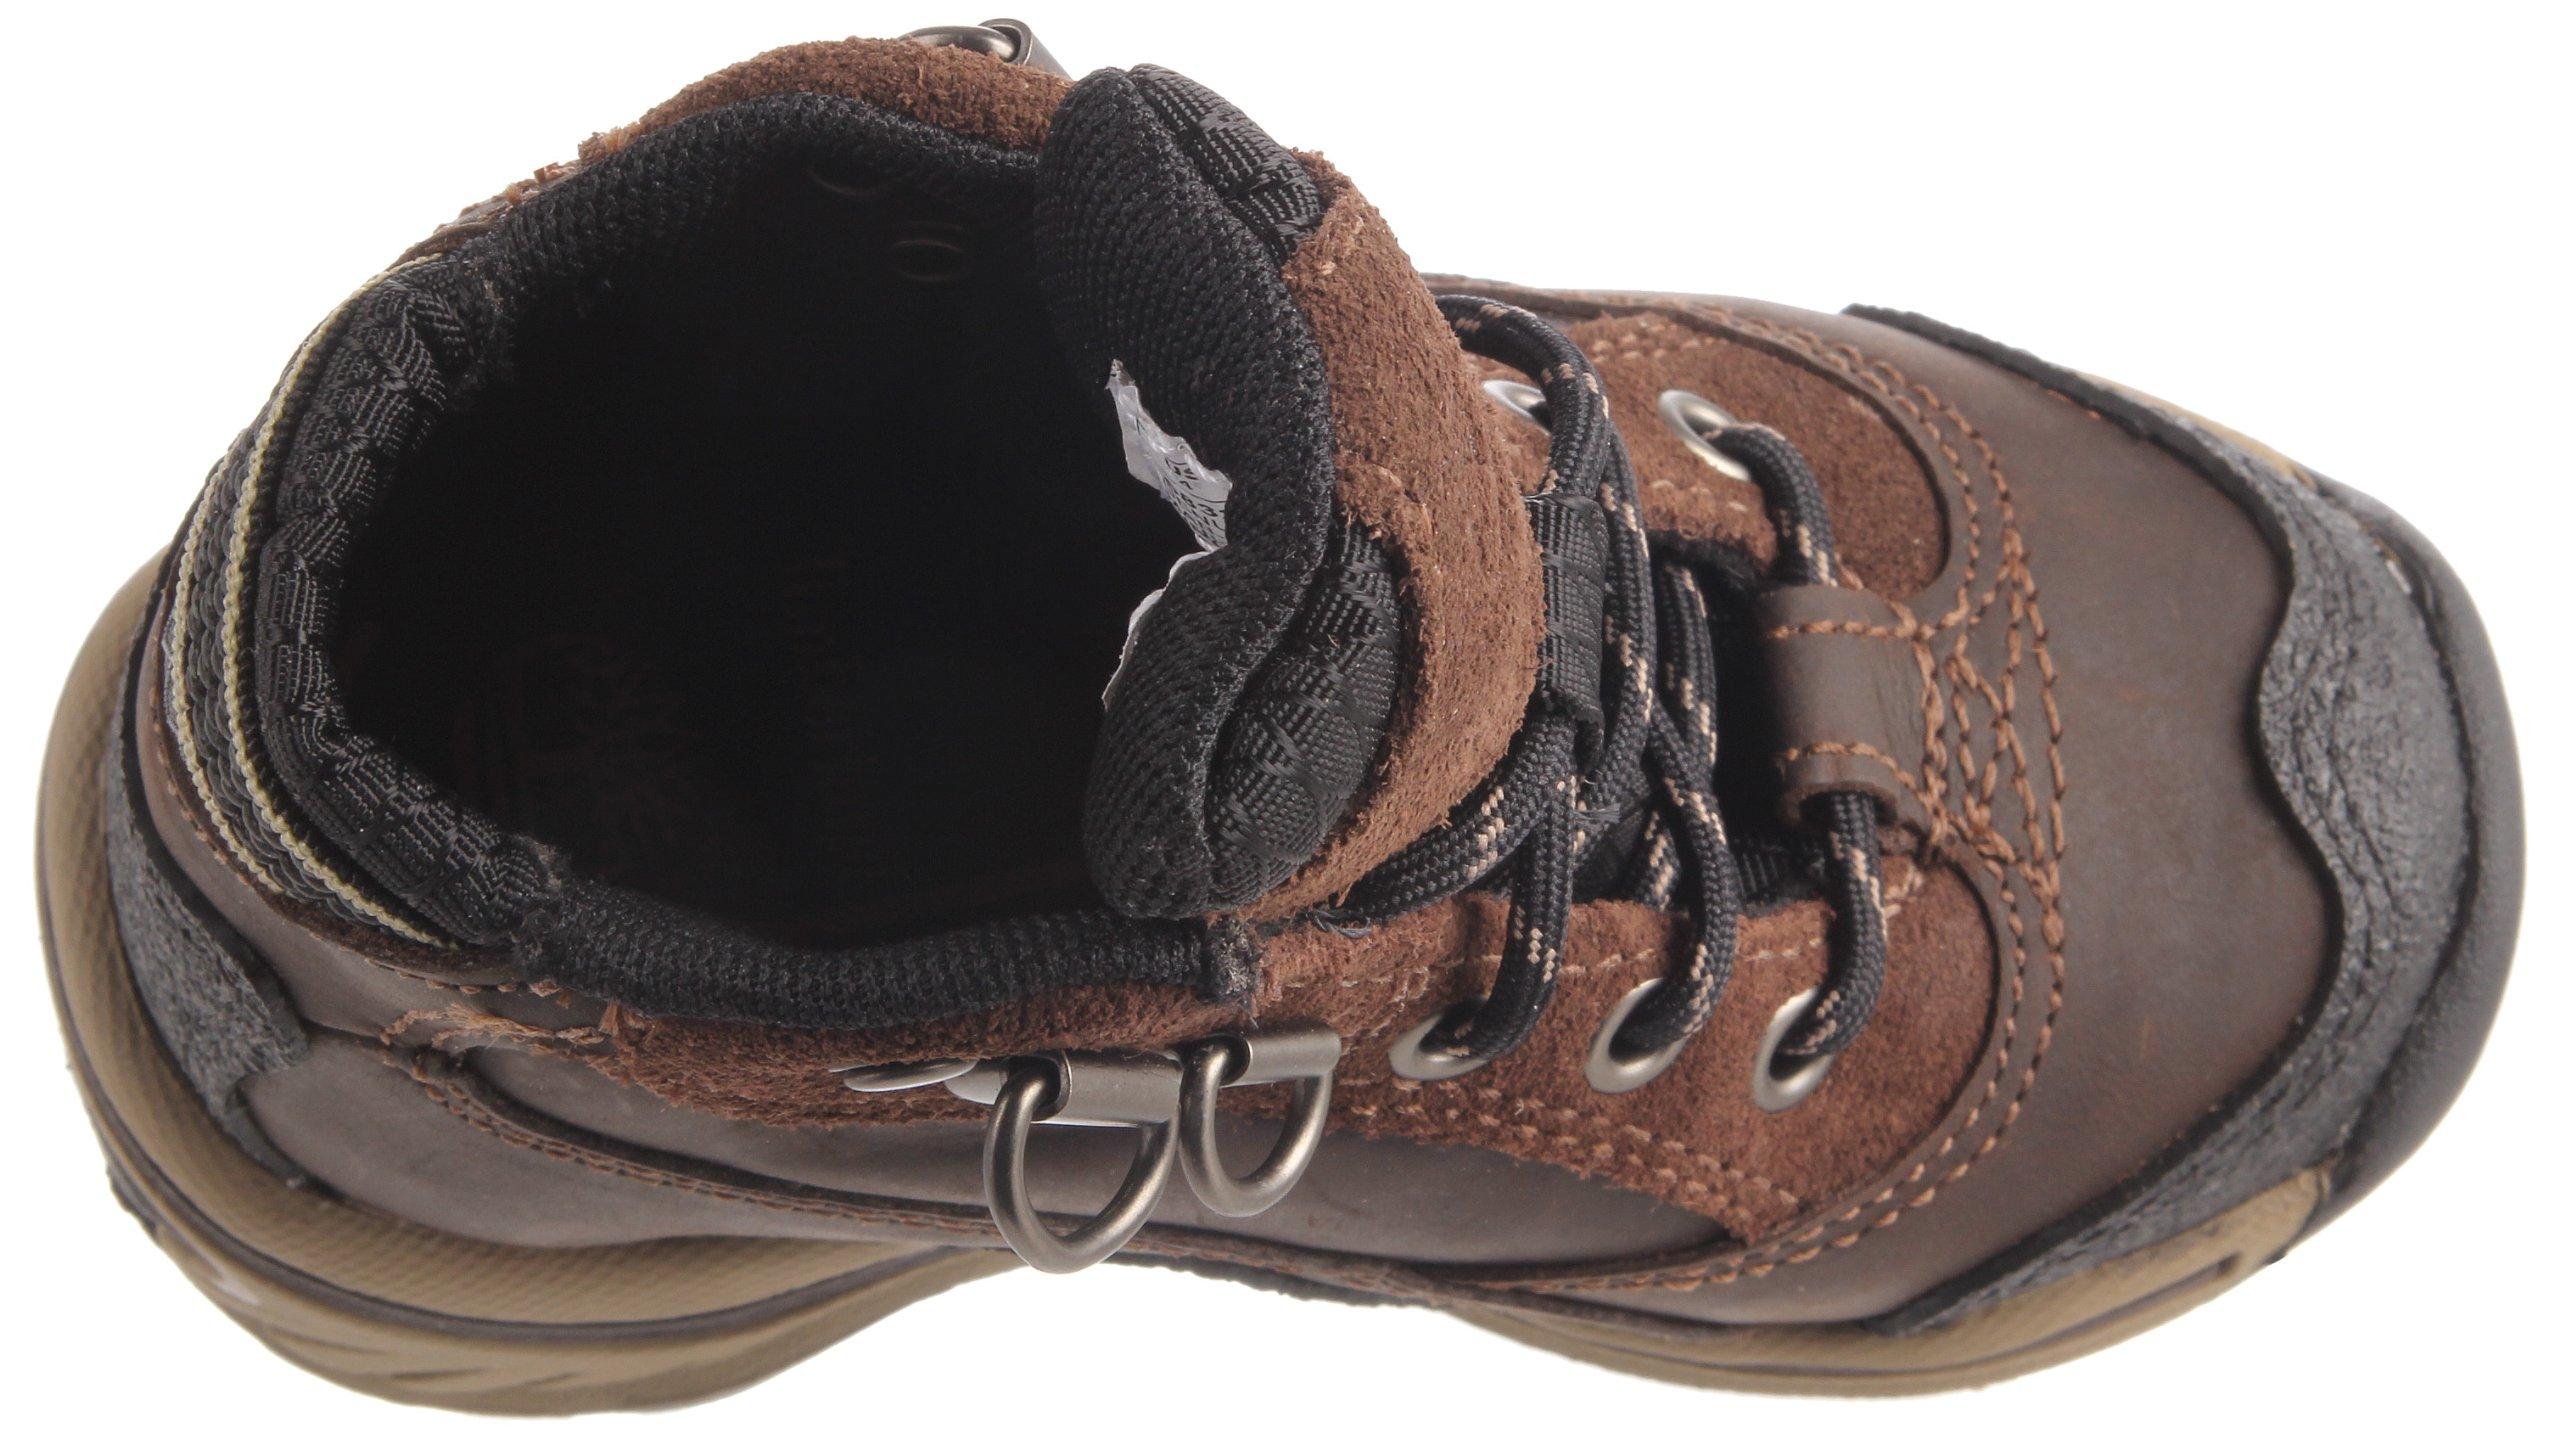 Timberland Pawtuckaway, Unisex-Child Hiking Shoes 7